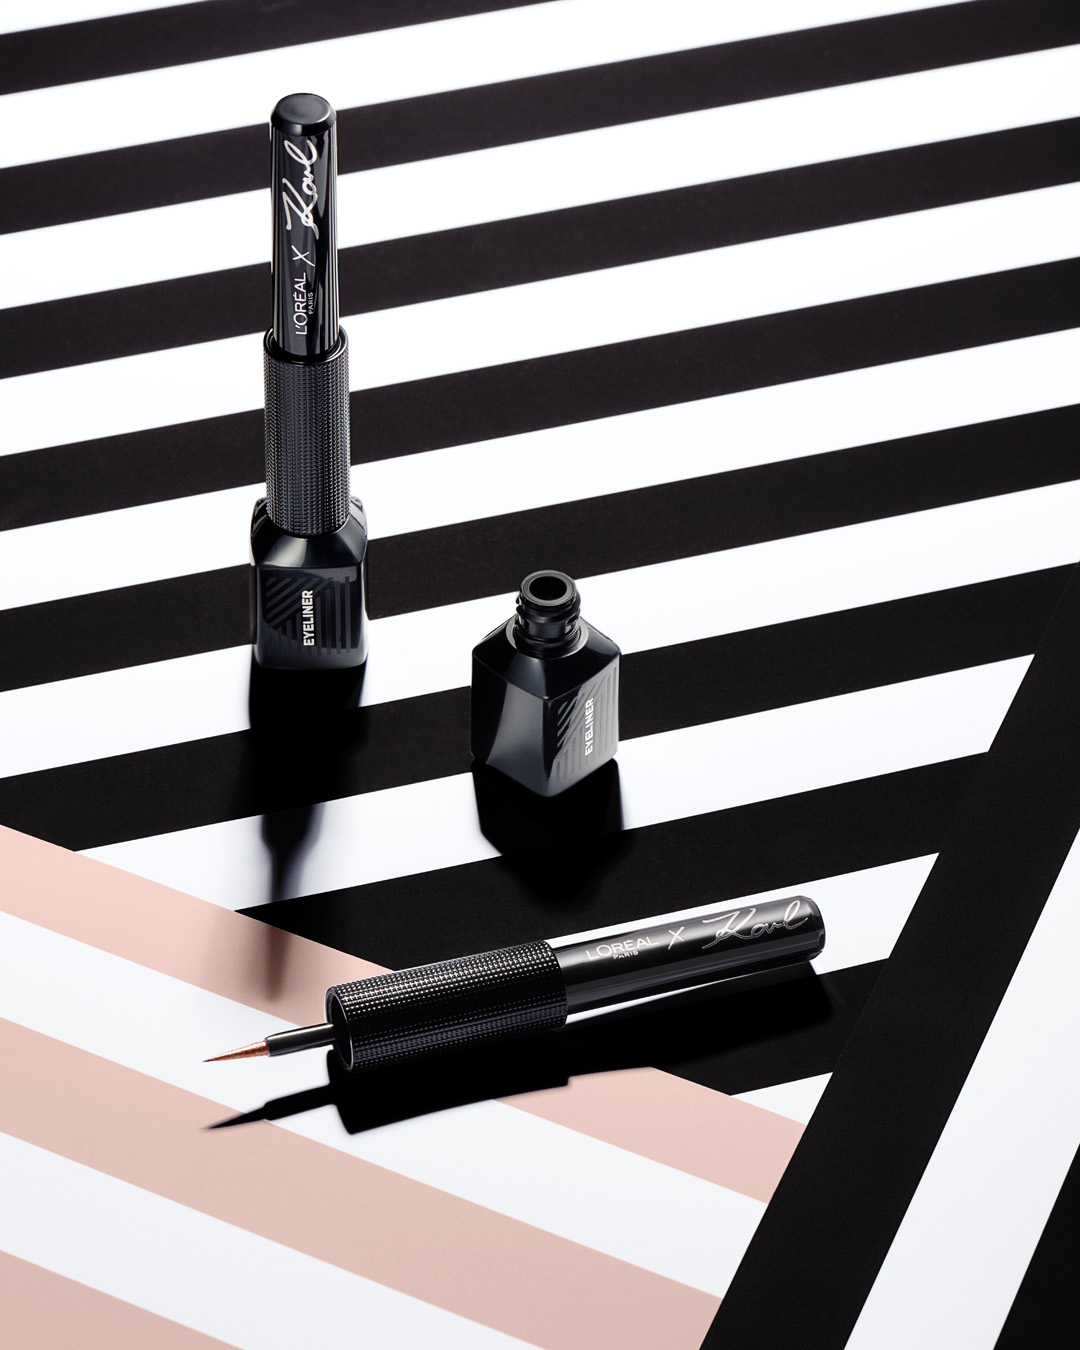 Karl Lagerfeld x L'Oreal Paris